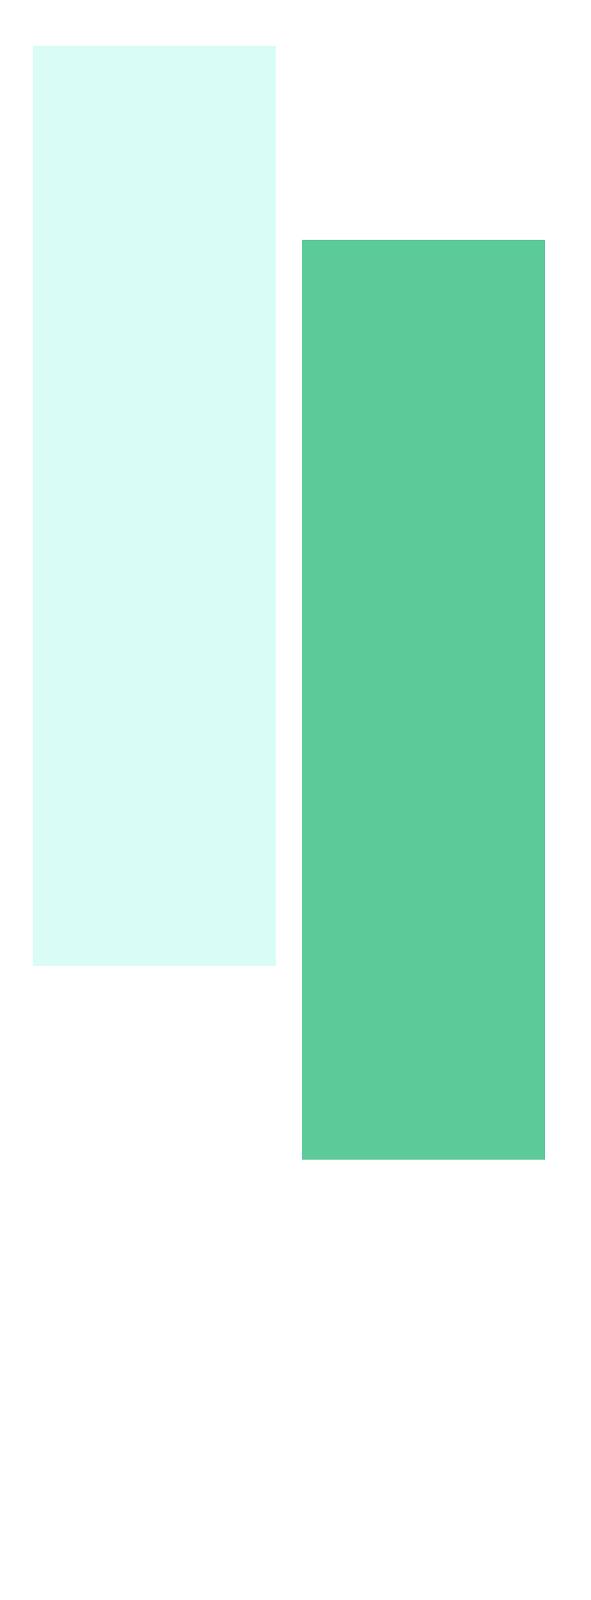 green-samples